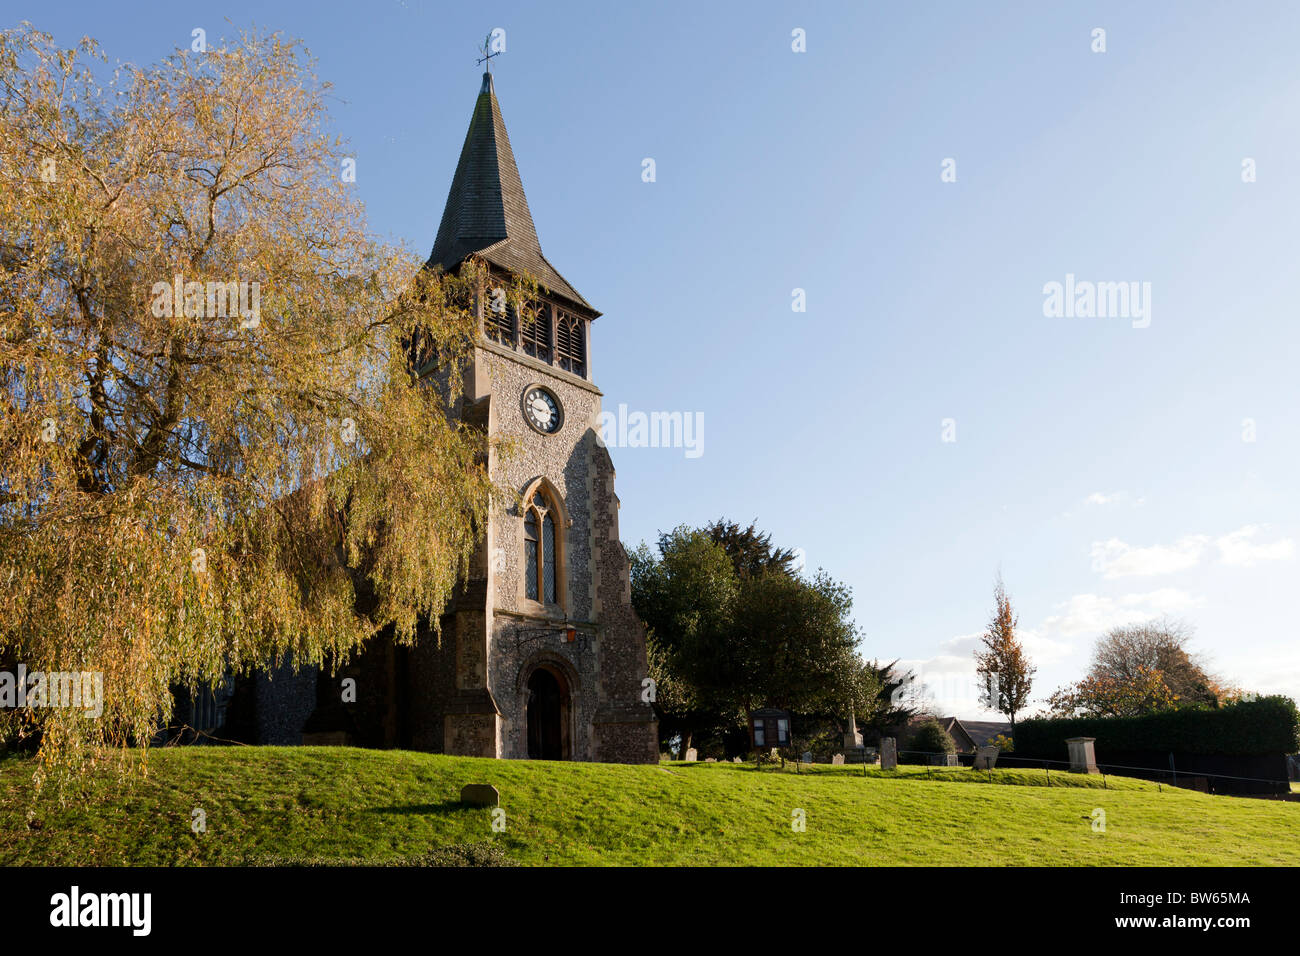 The Parish Church of St Nicholas, Wickham Village church on a hill with shingle spire - Stock Image